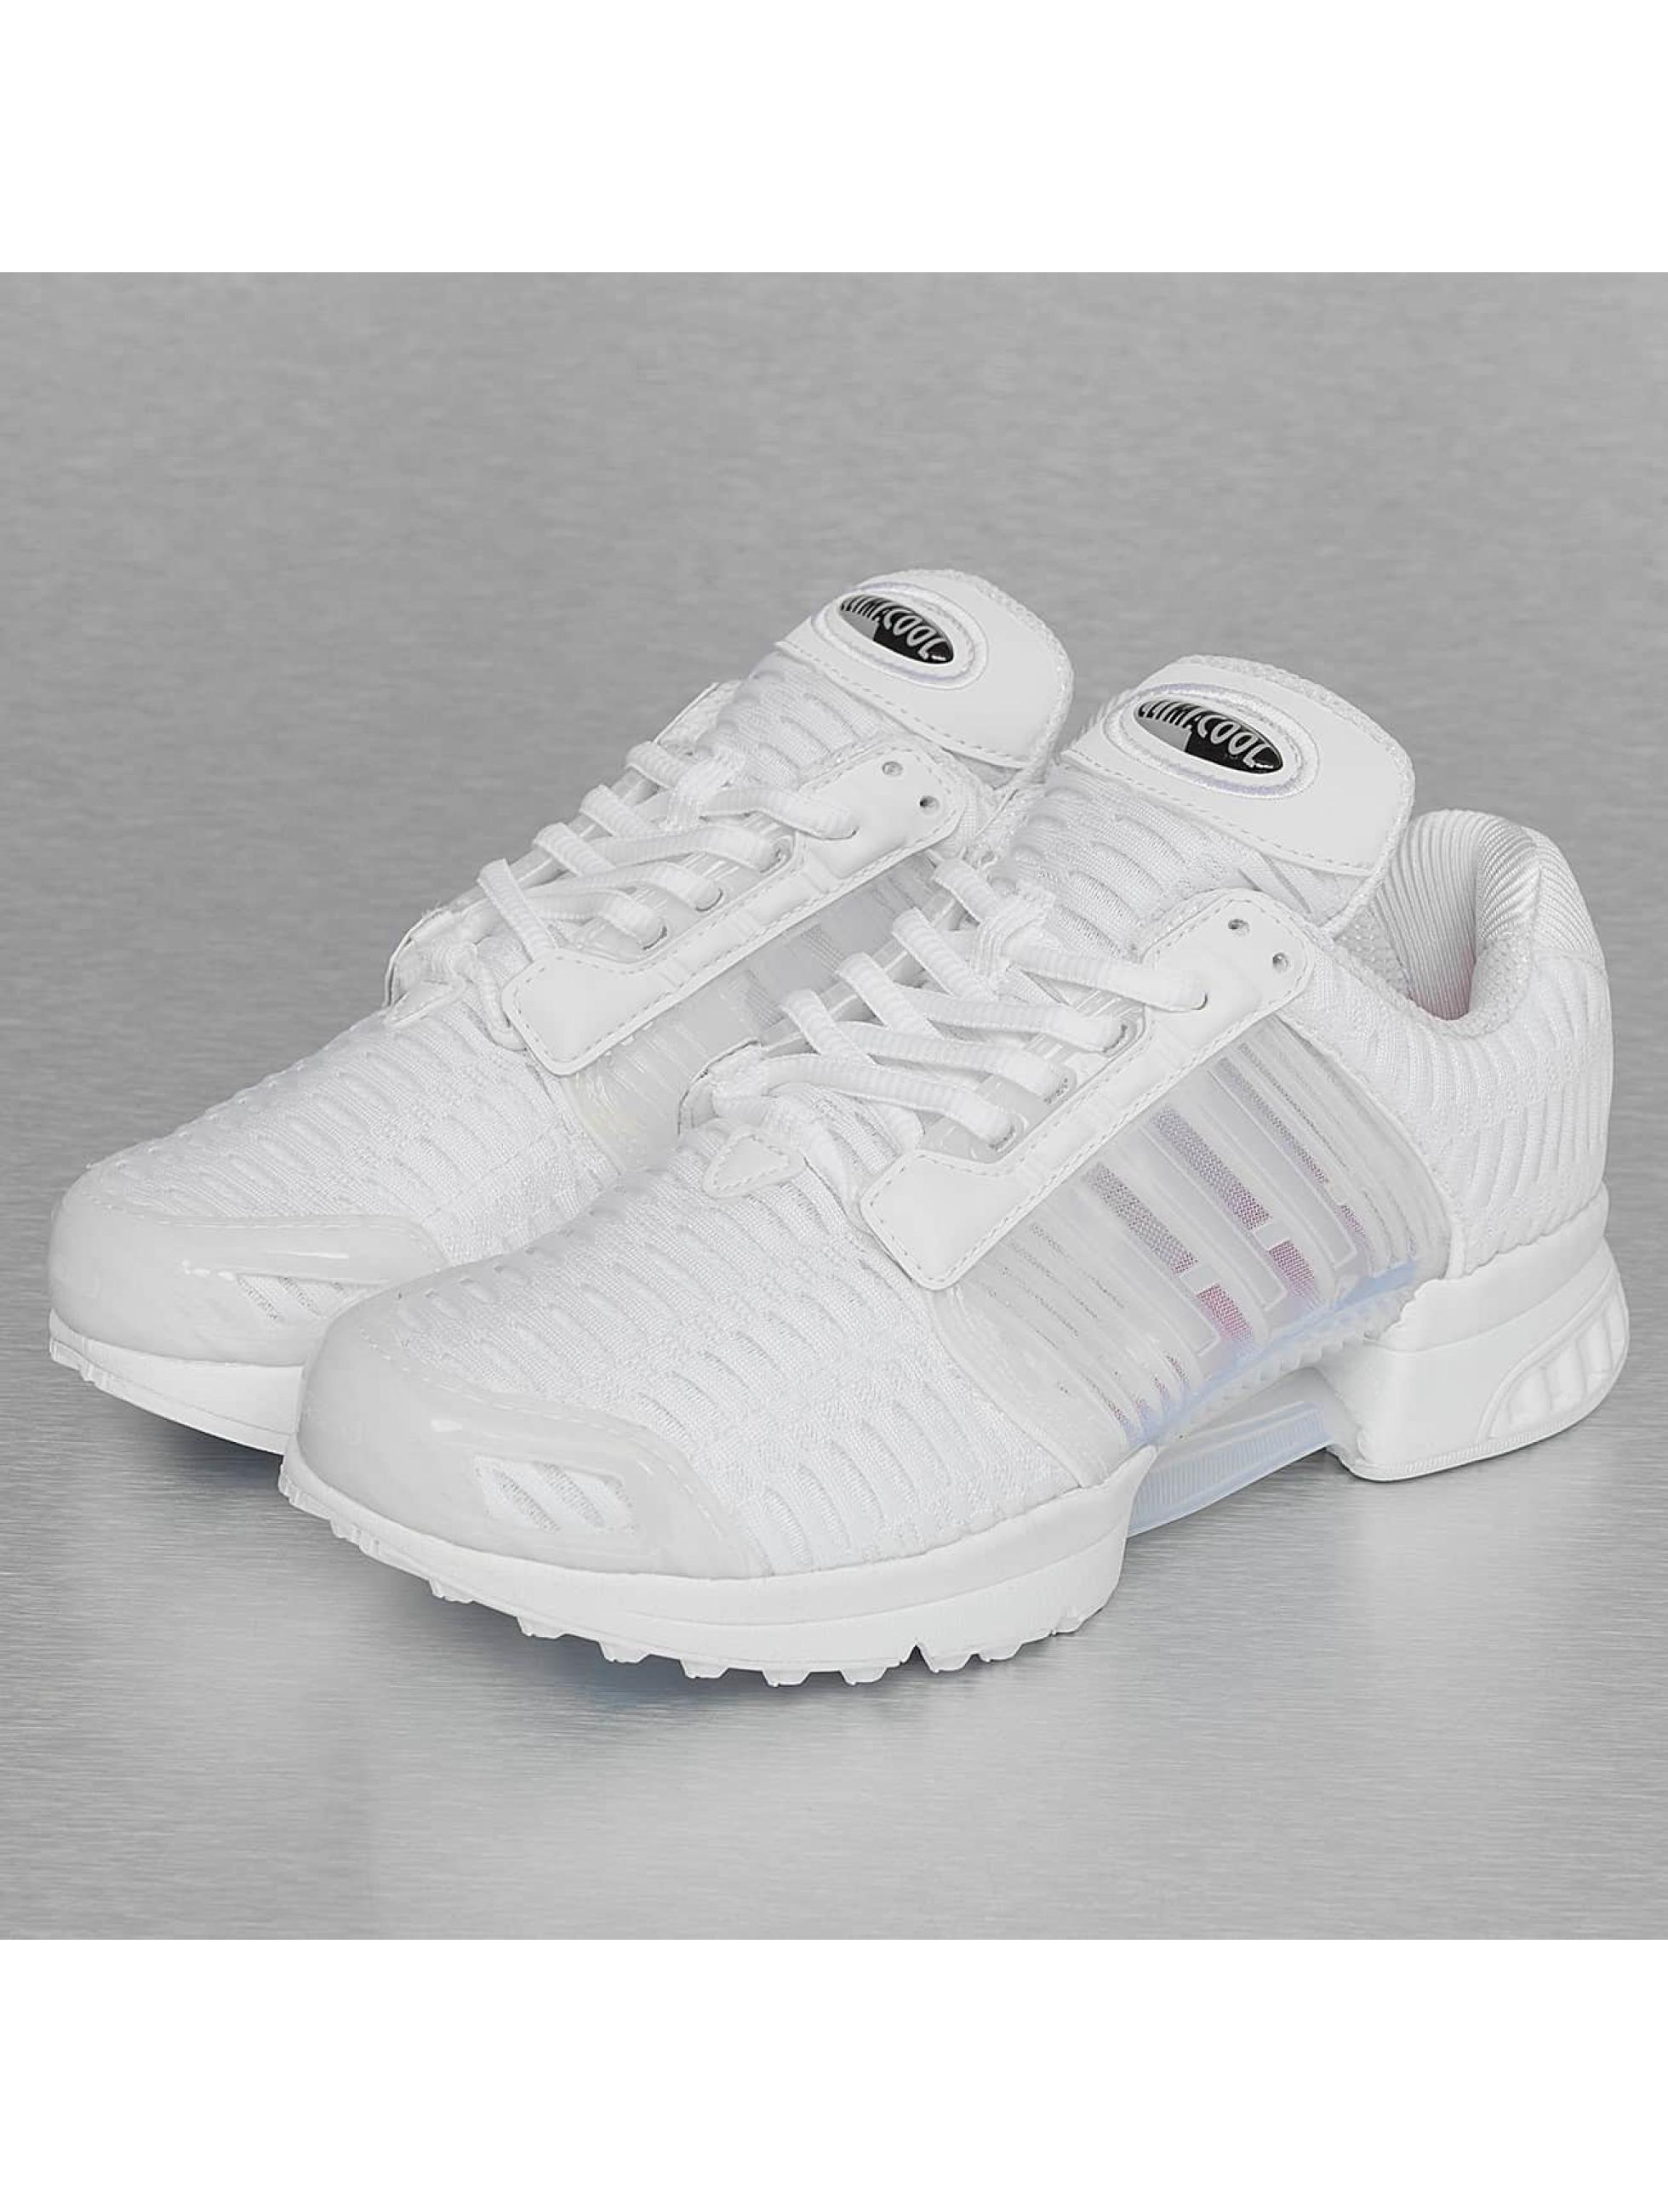 adidas Chaussures / Baskets Climacool 1 J en blanc